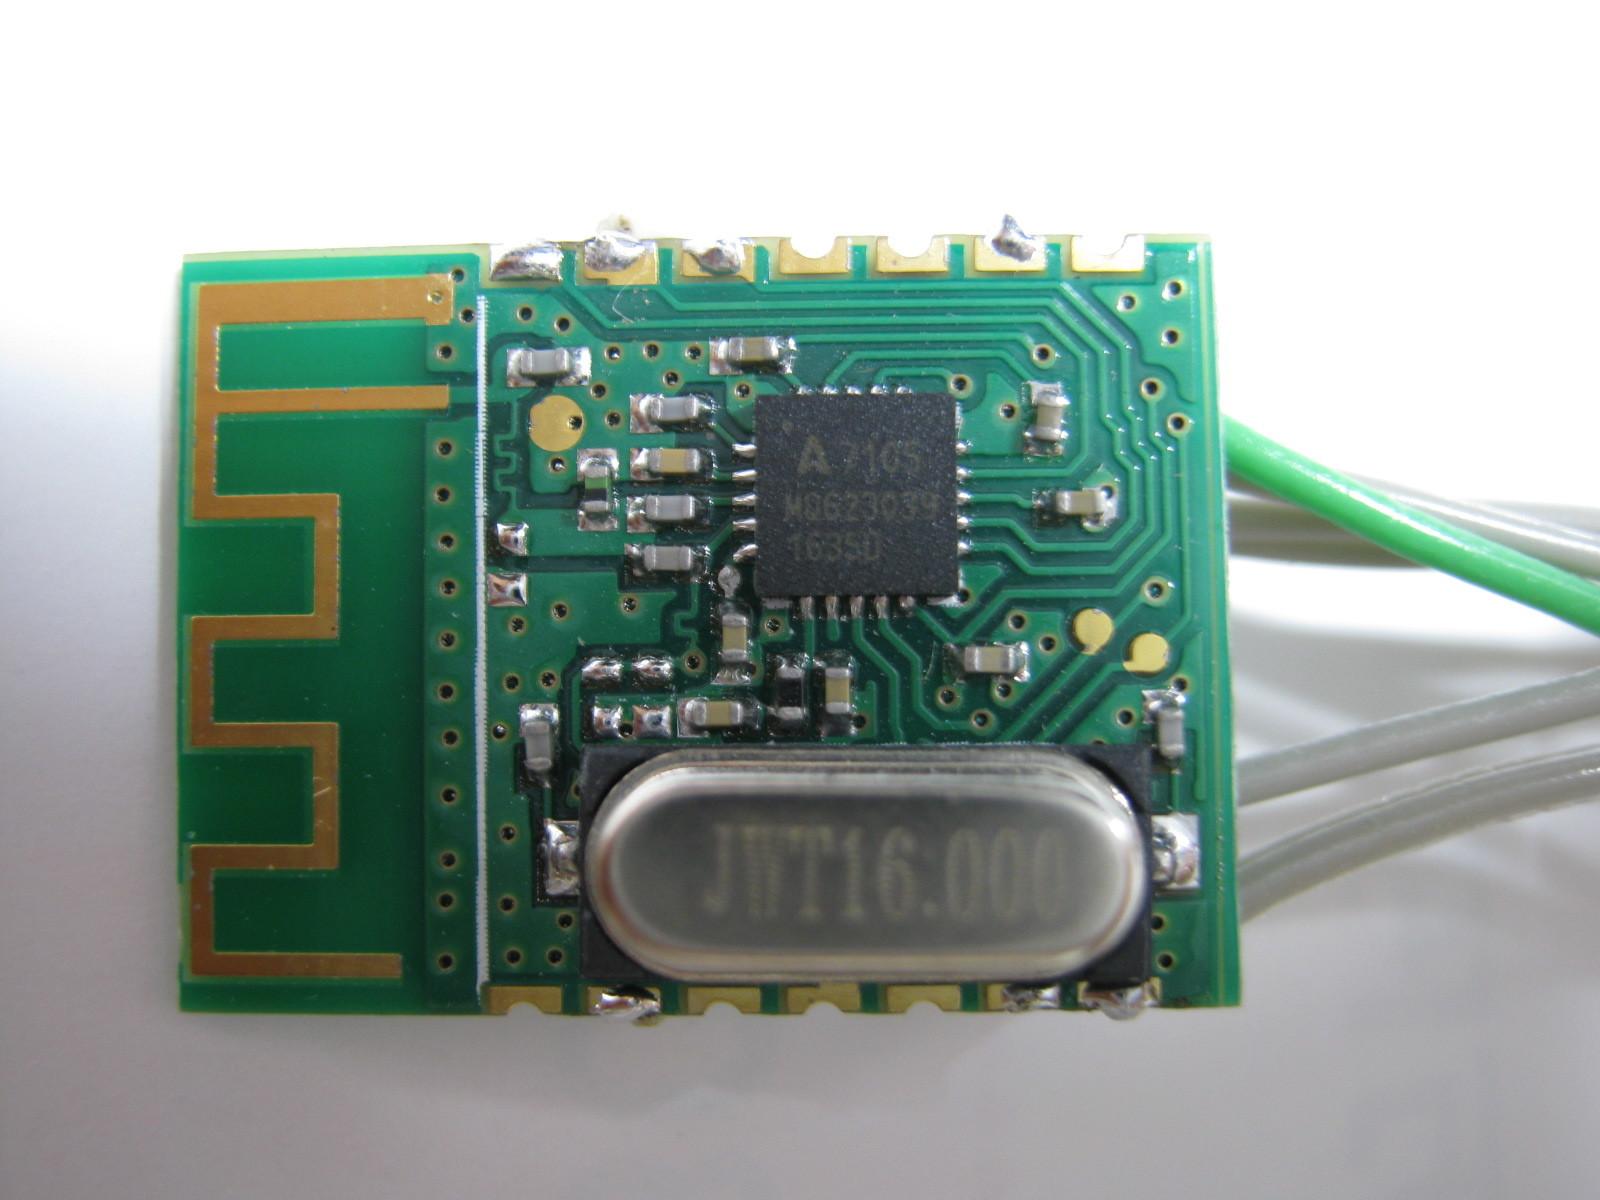 2.4GHzラジコン用ファームウェア製作(A7105)表